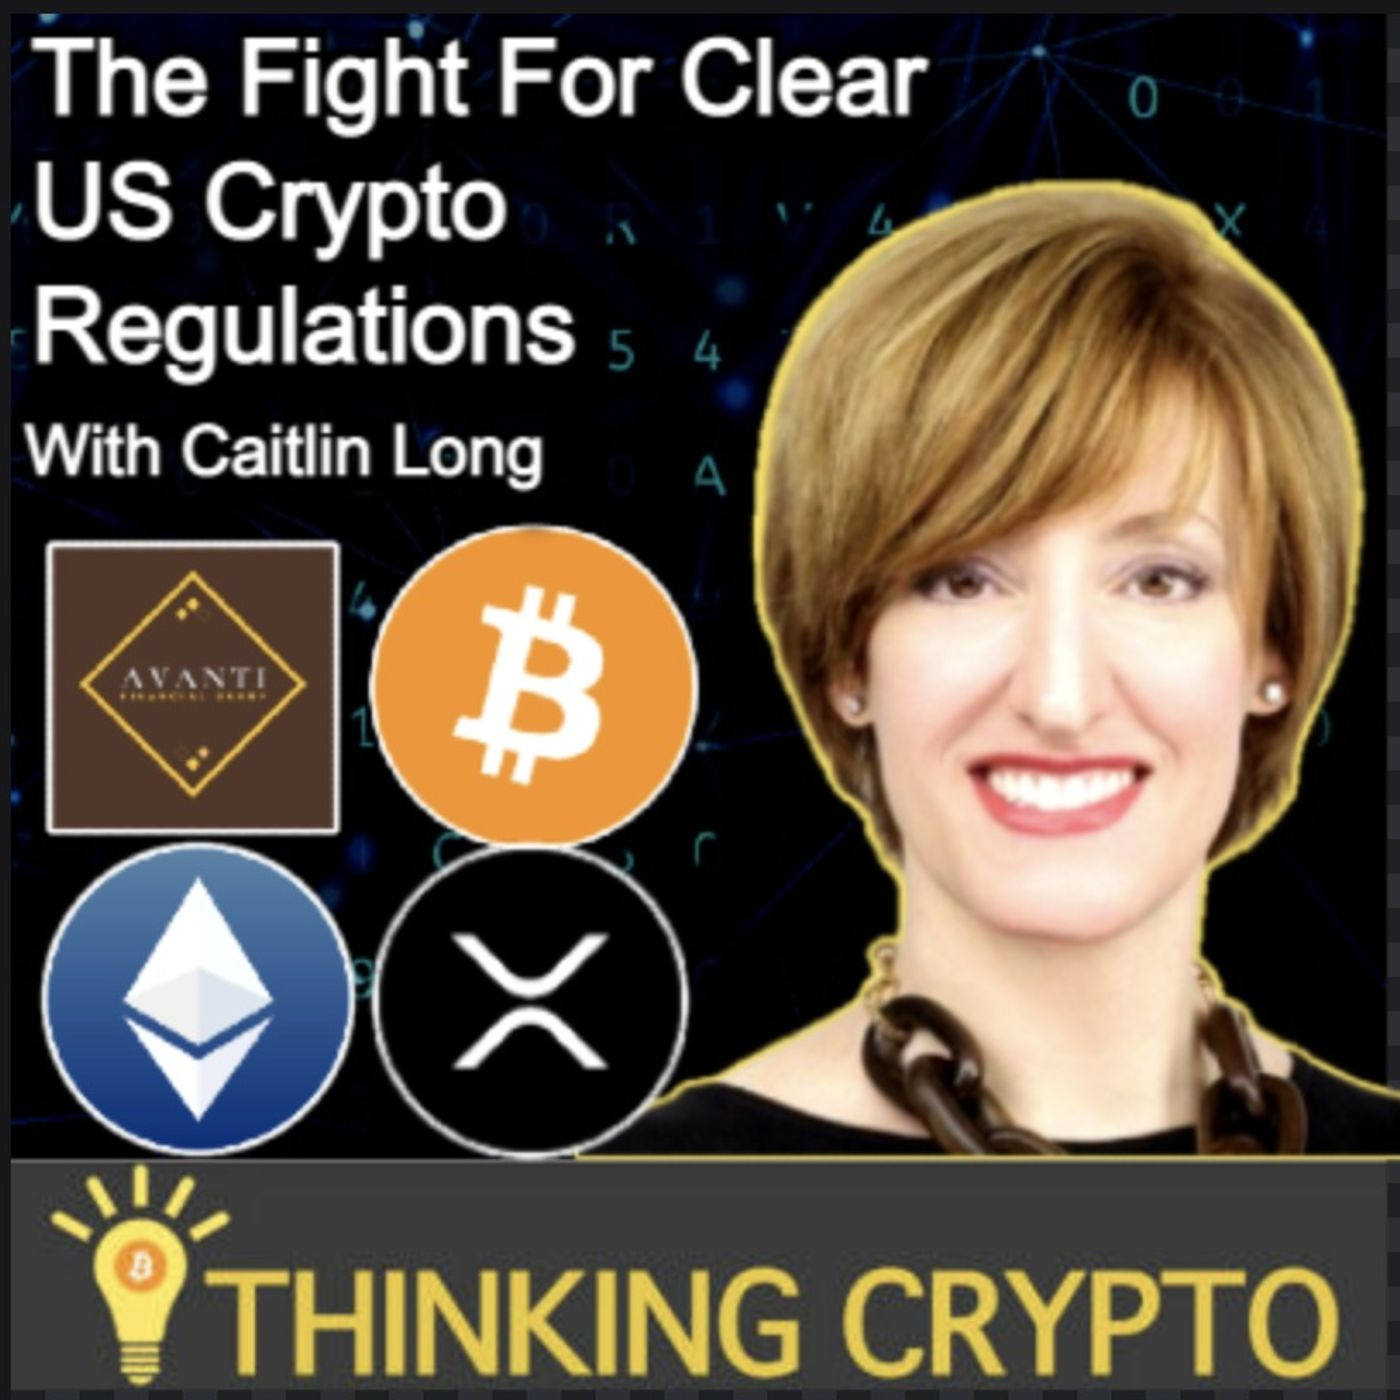 Caitlin Long Interview - Avanti Bank & The Fed - US Crypto Regulations - Bitcoin ETF, Gary Gensler SEC Ripple XRP